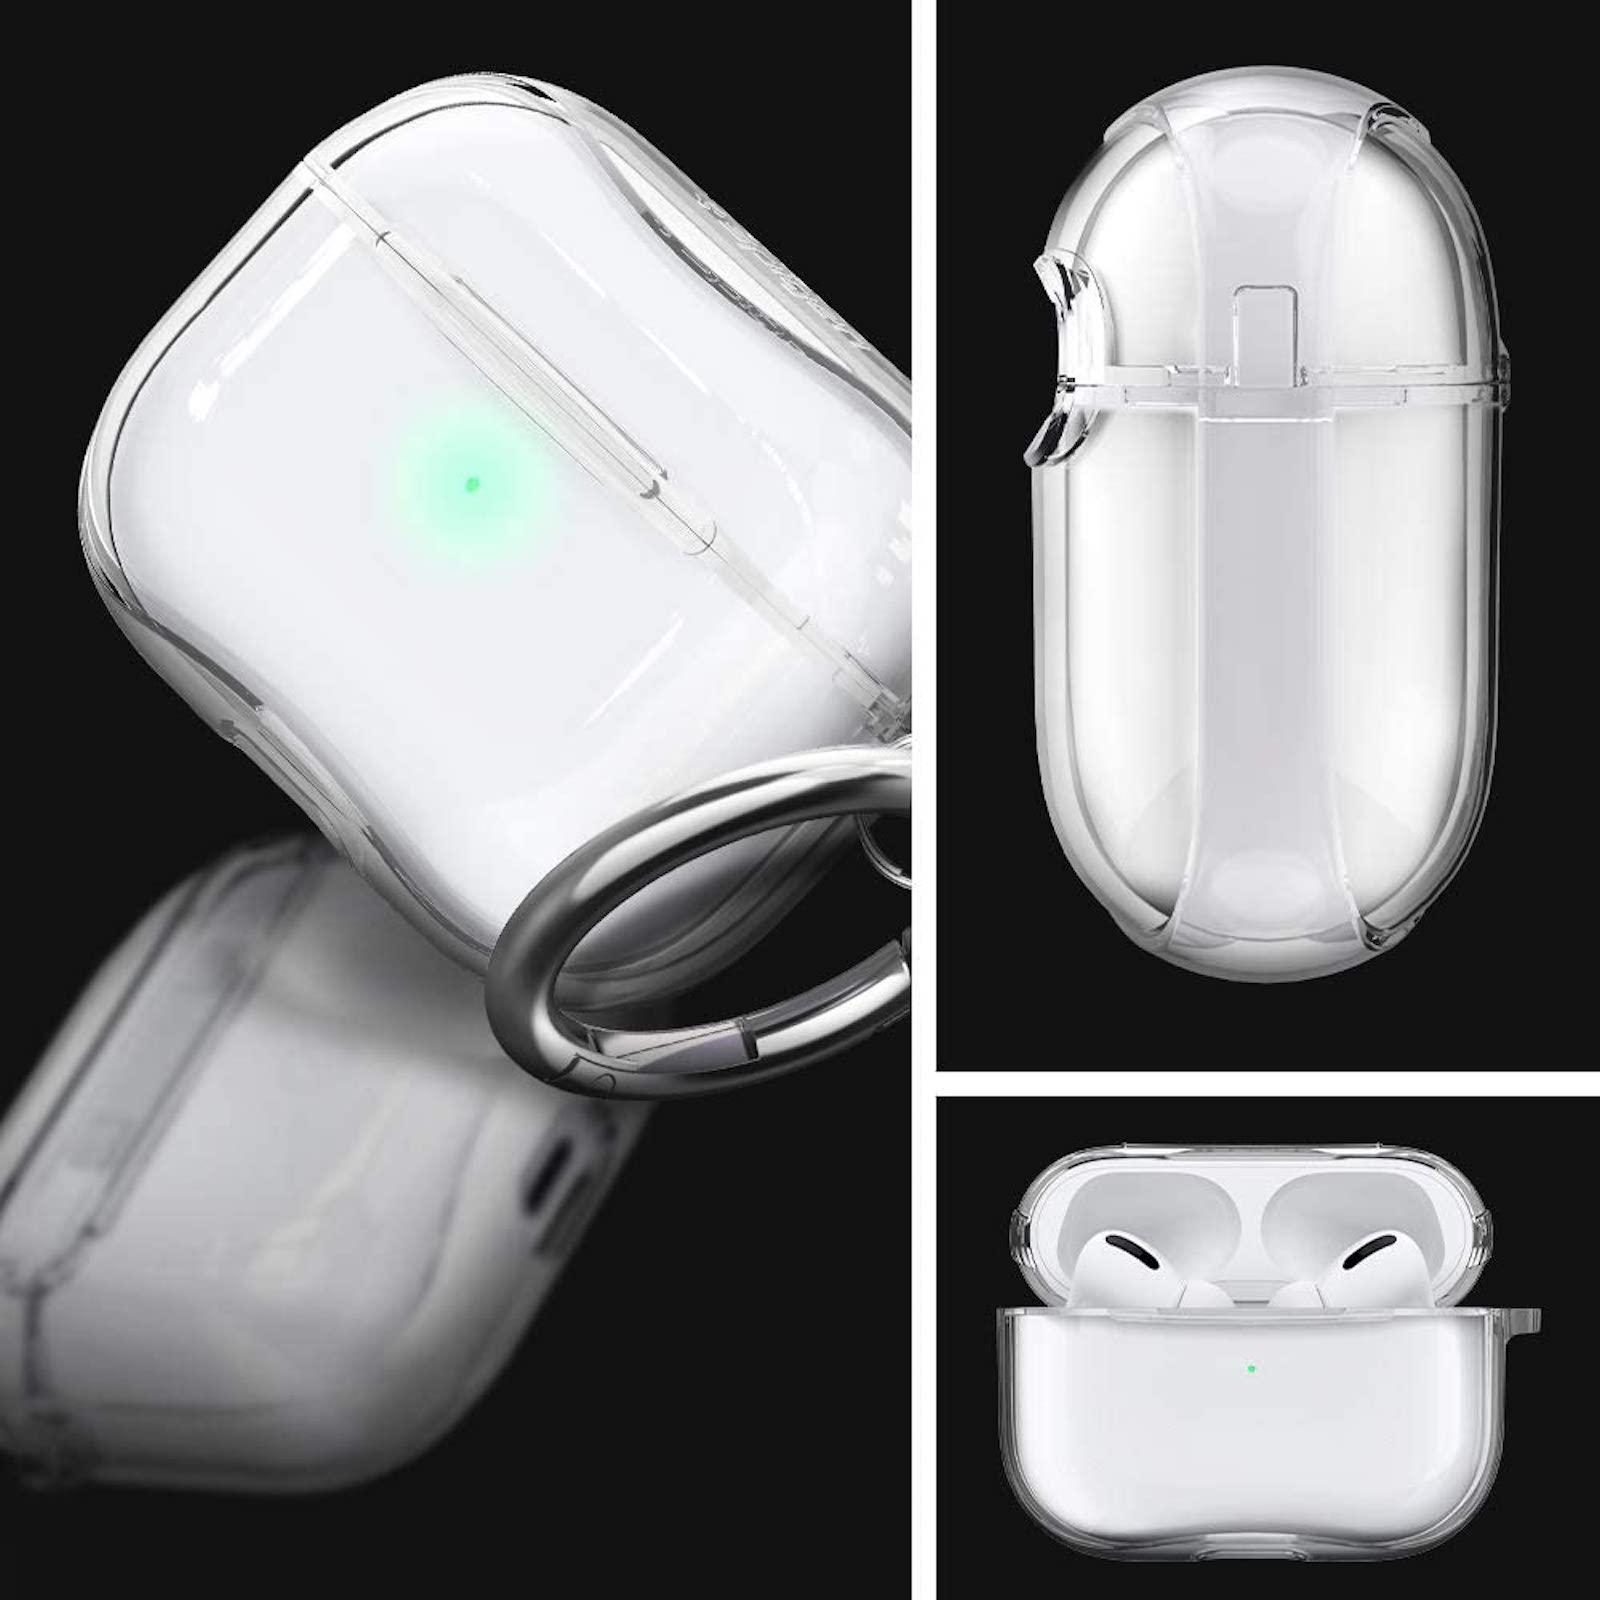 spigen-ultra-hybrid-airpodspro-case-sale-2.jpg